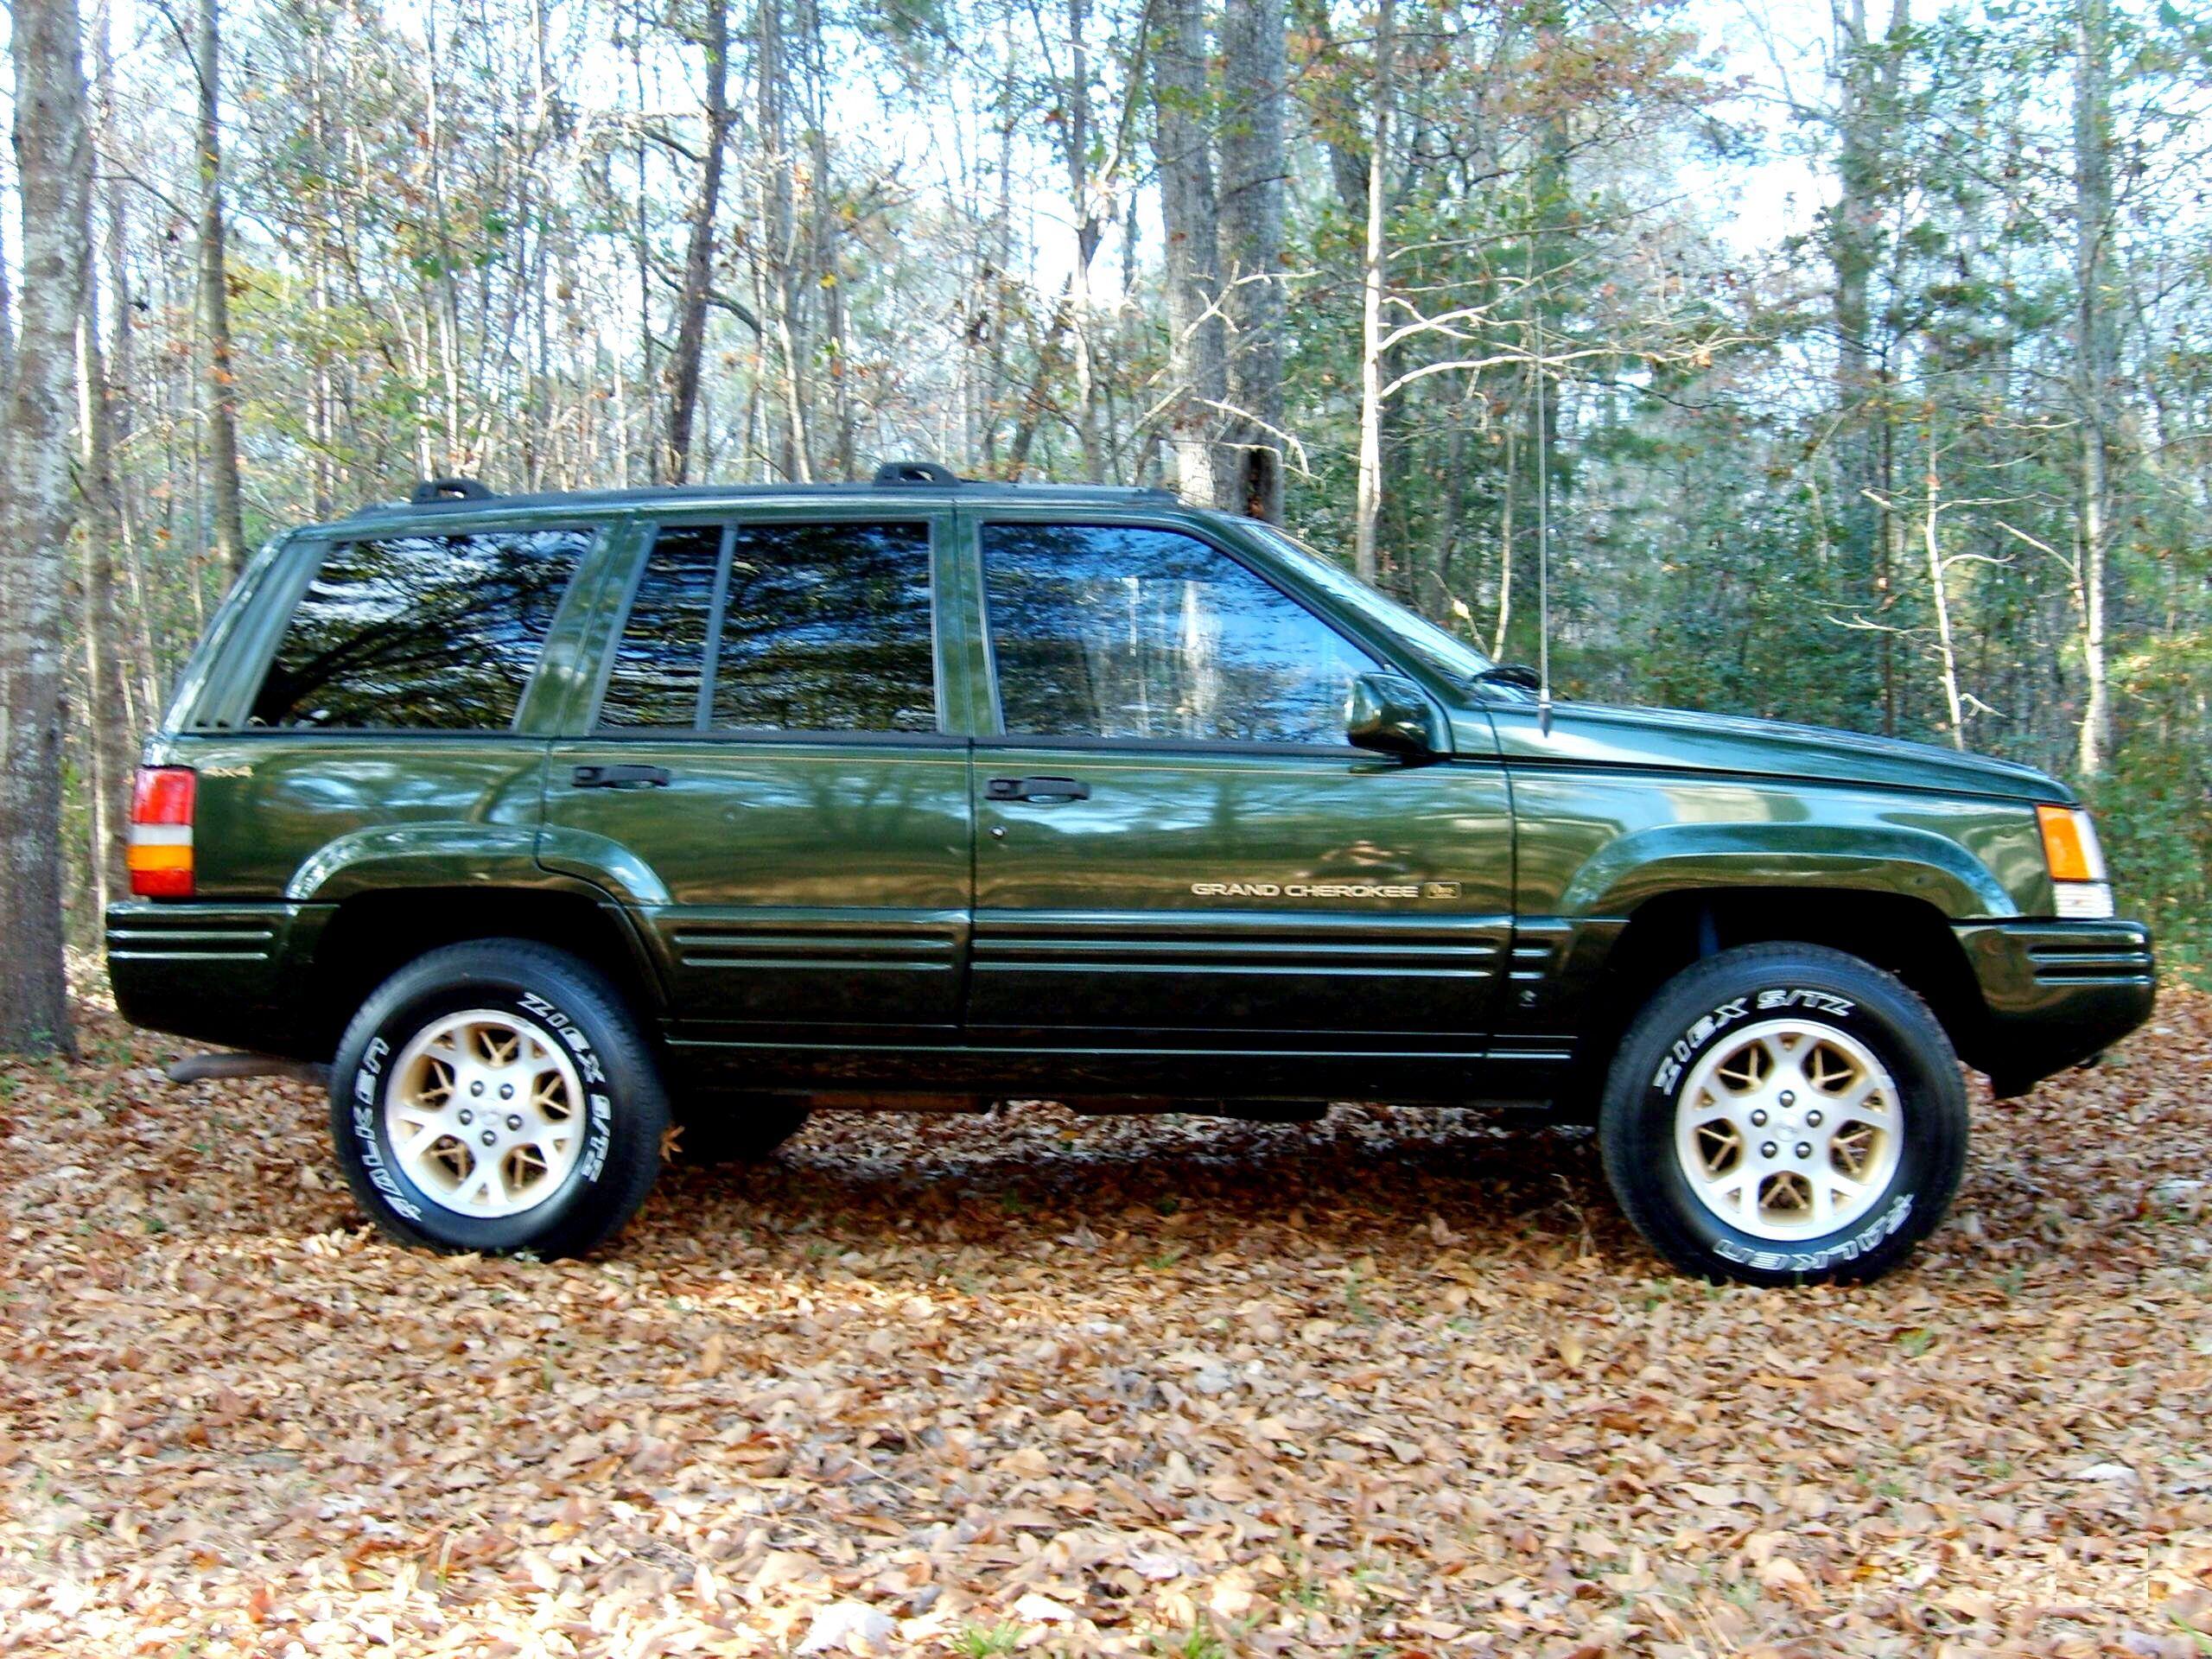 1997 jeep grand cherokee limited jeeps pinterest. Black Bedroom Furniture Sets. Home Design Ideas